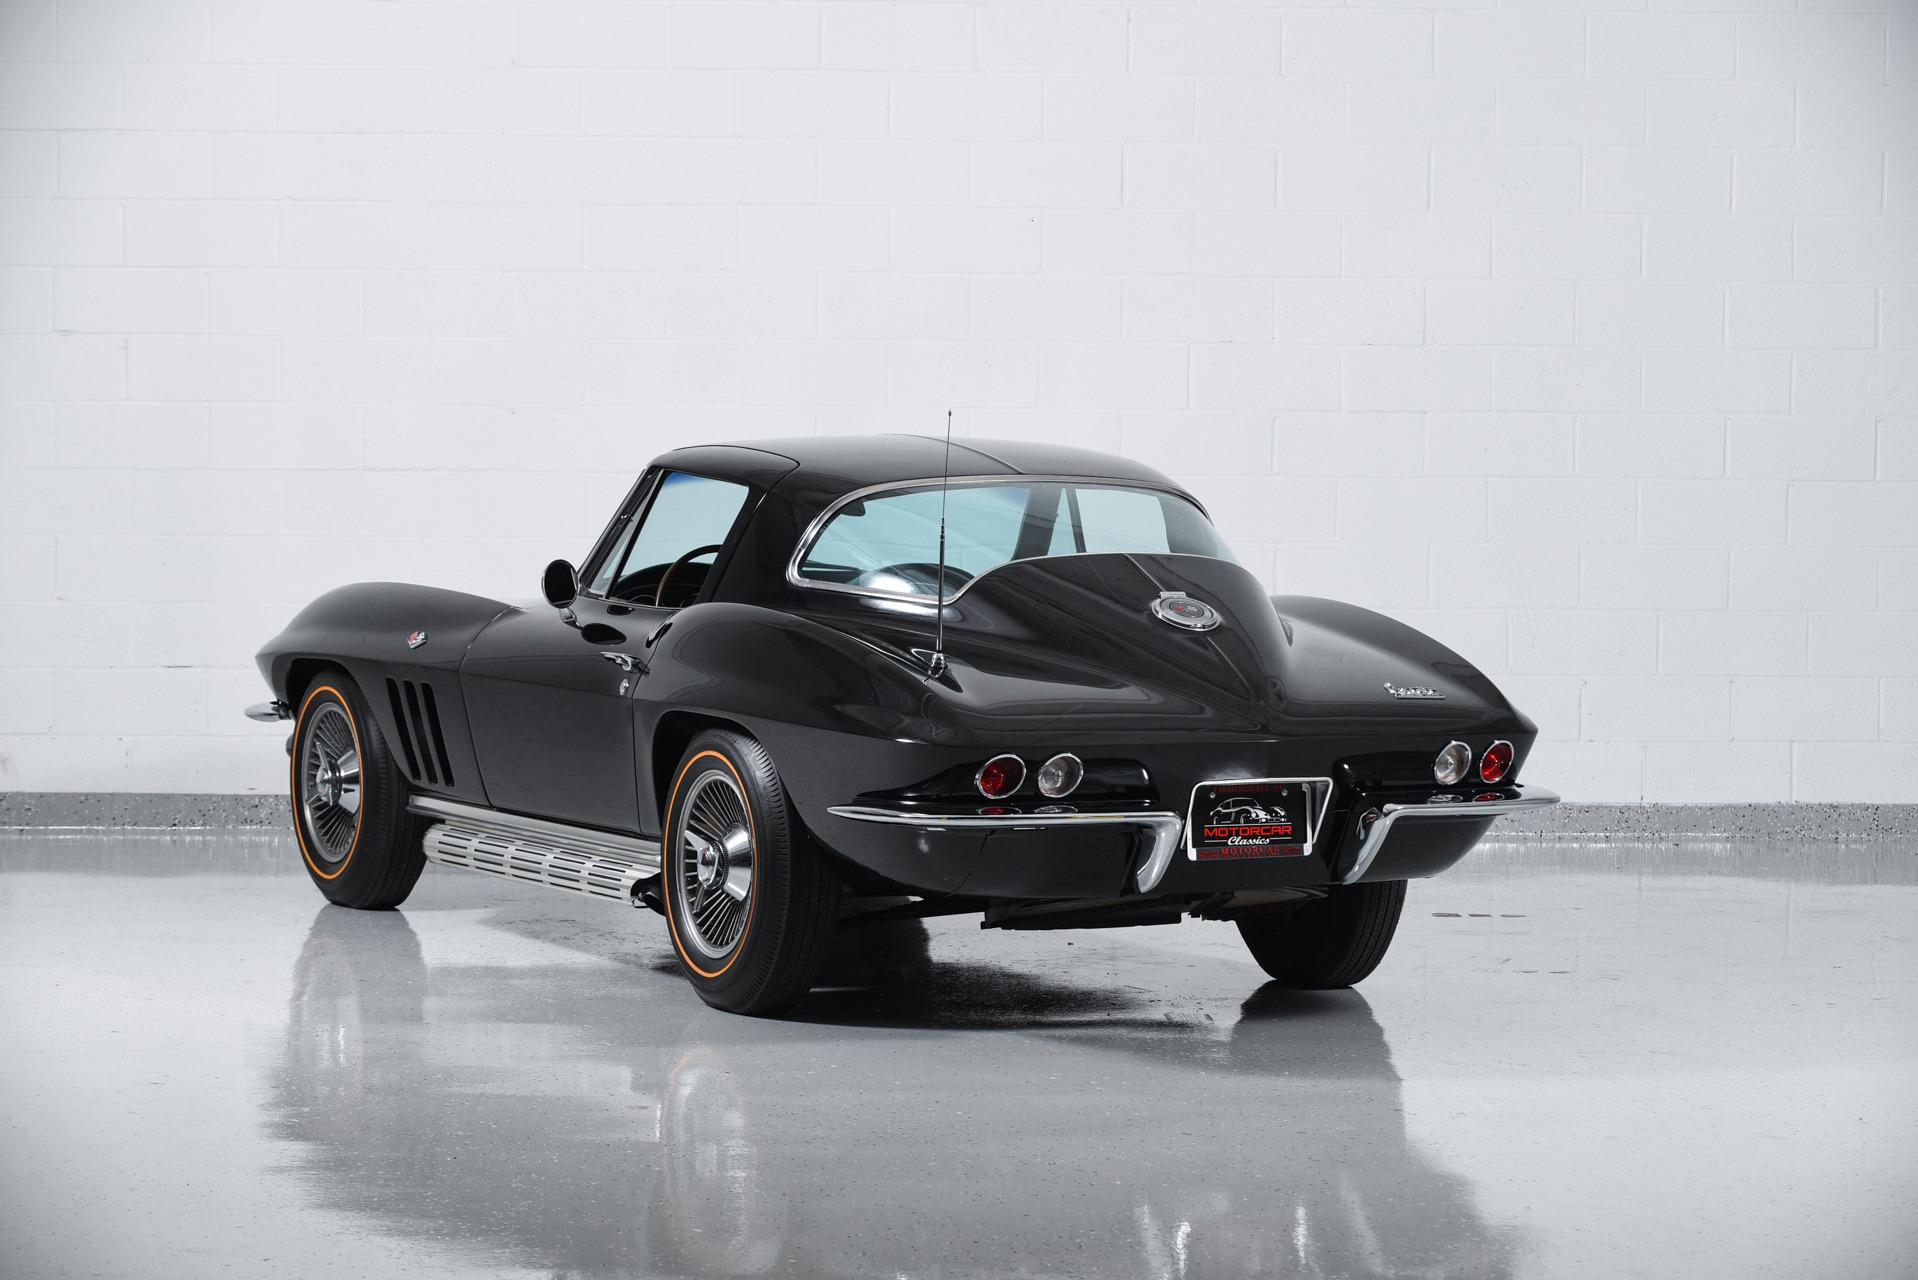 1966 Chevrolet Corvette Motorcar Classics Exotic And Classic Car Bel Air Radiator